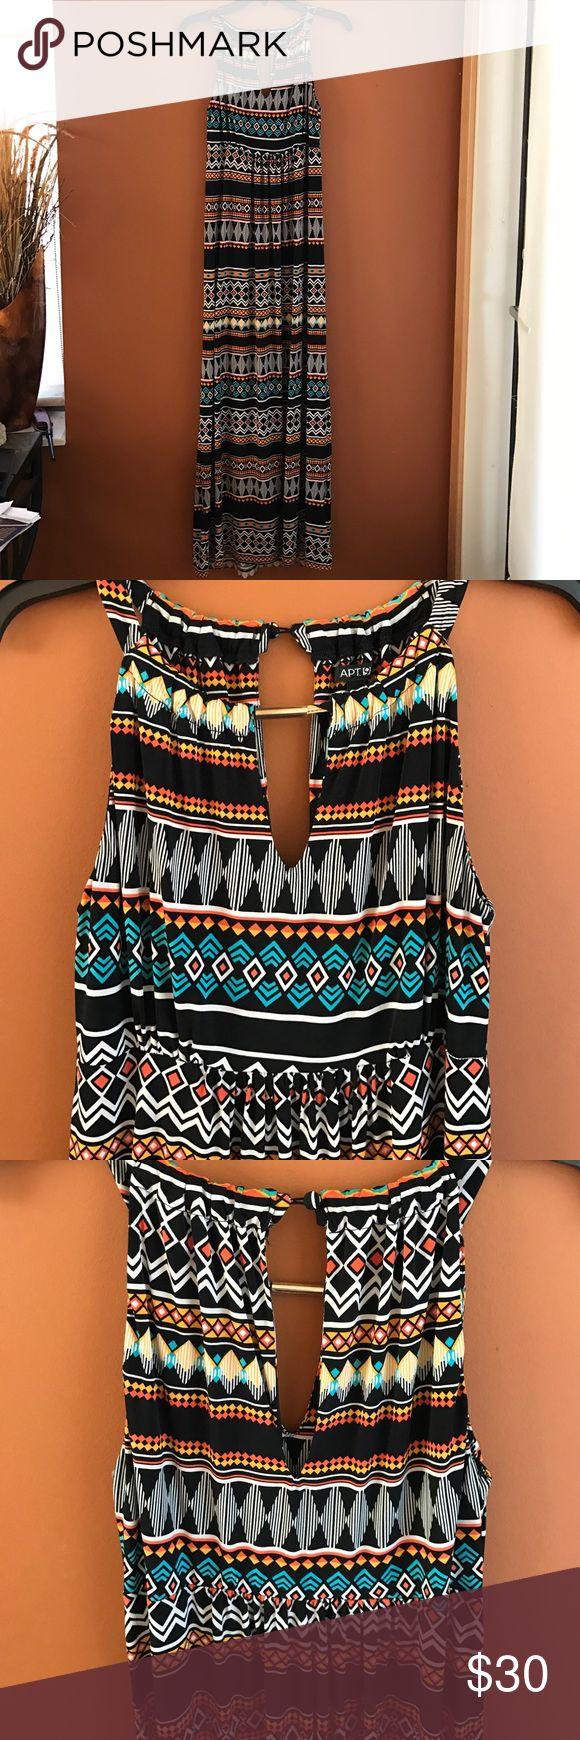 Tribal Maxi dress Apt 9 Maxi dress. In great condition! Apt. 9 Dresses Maxi